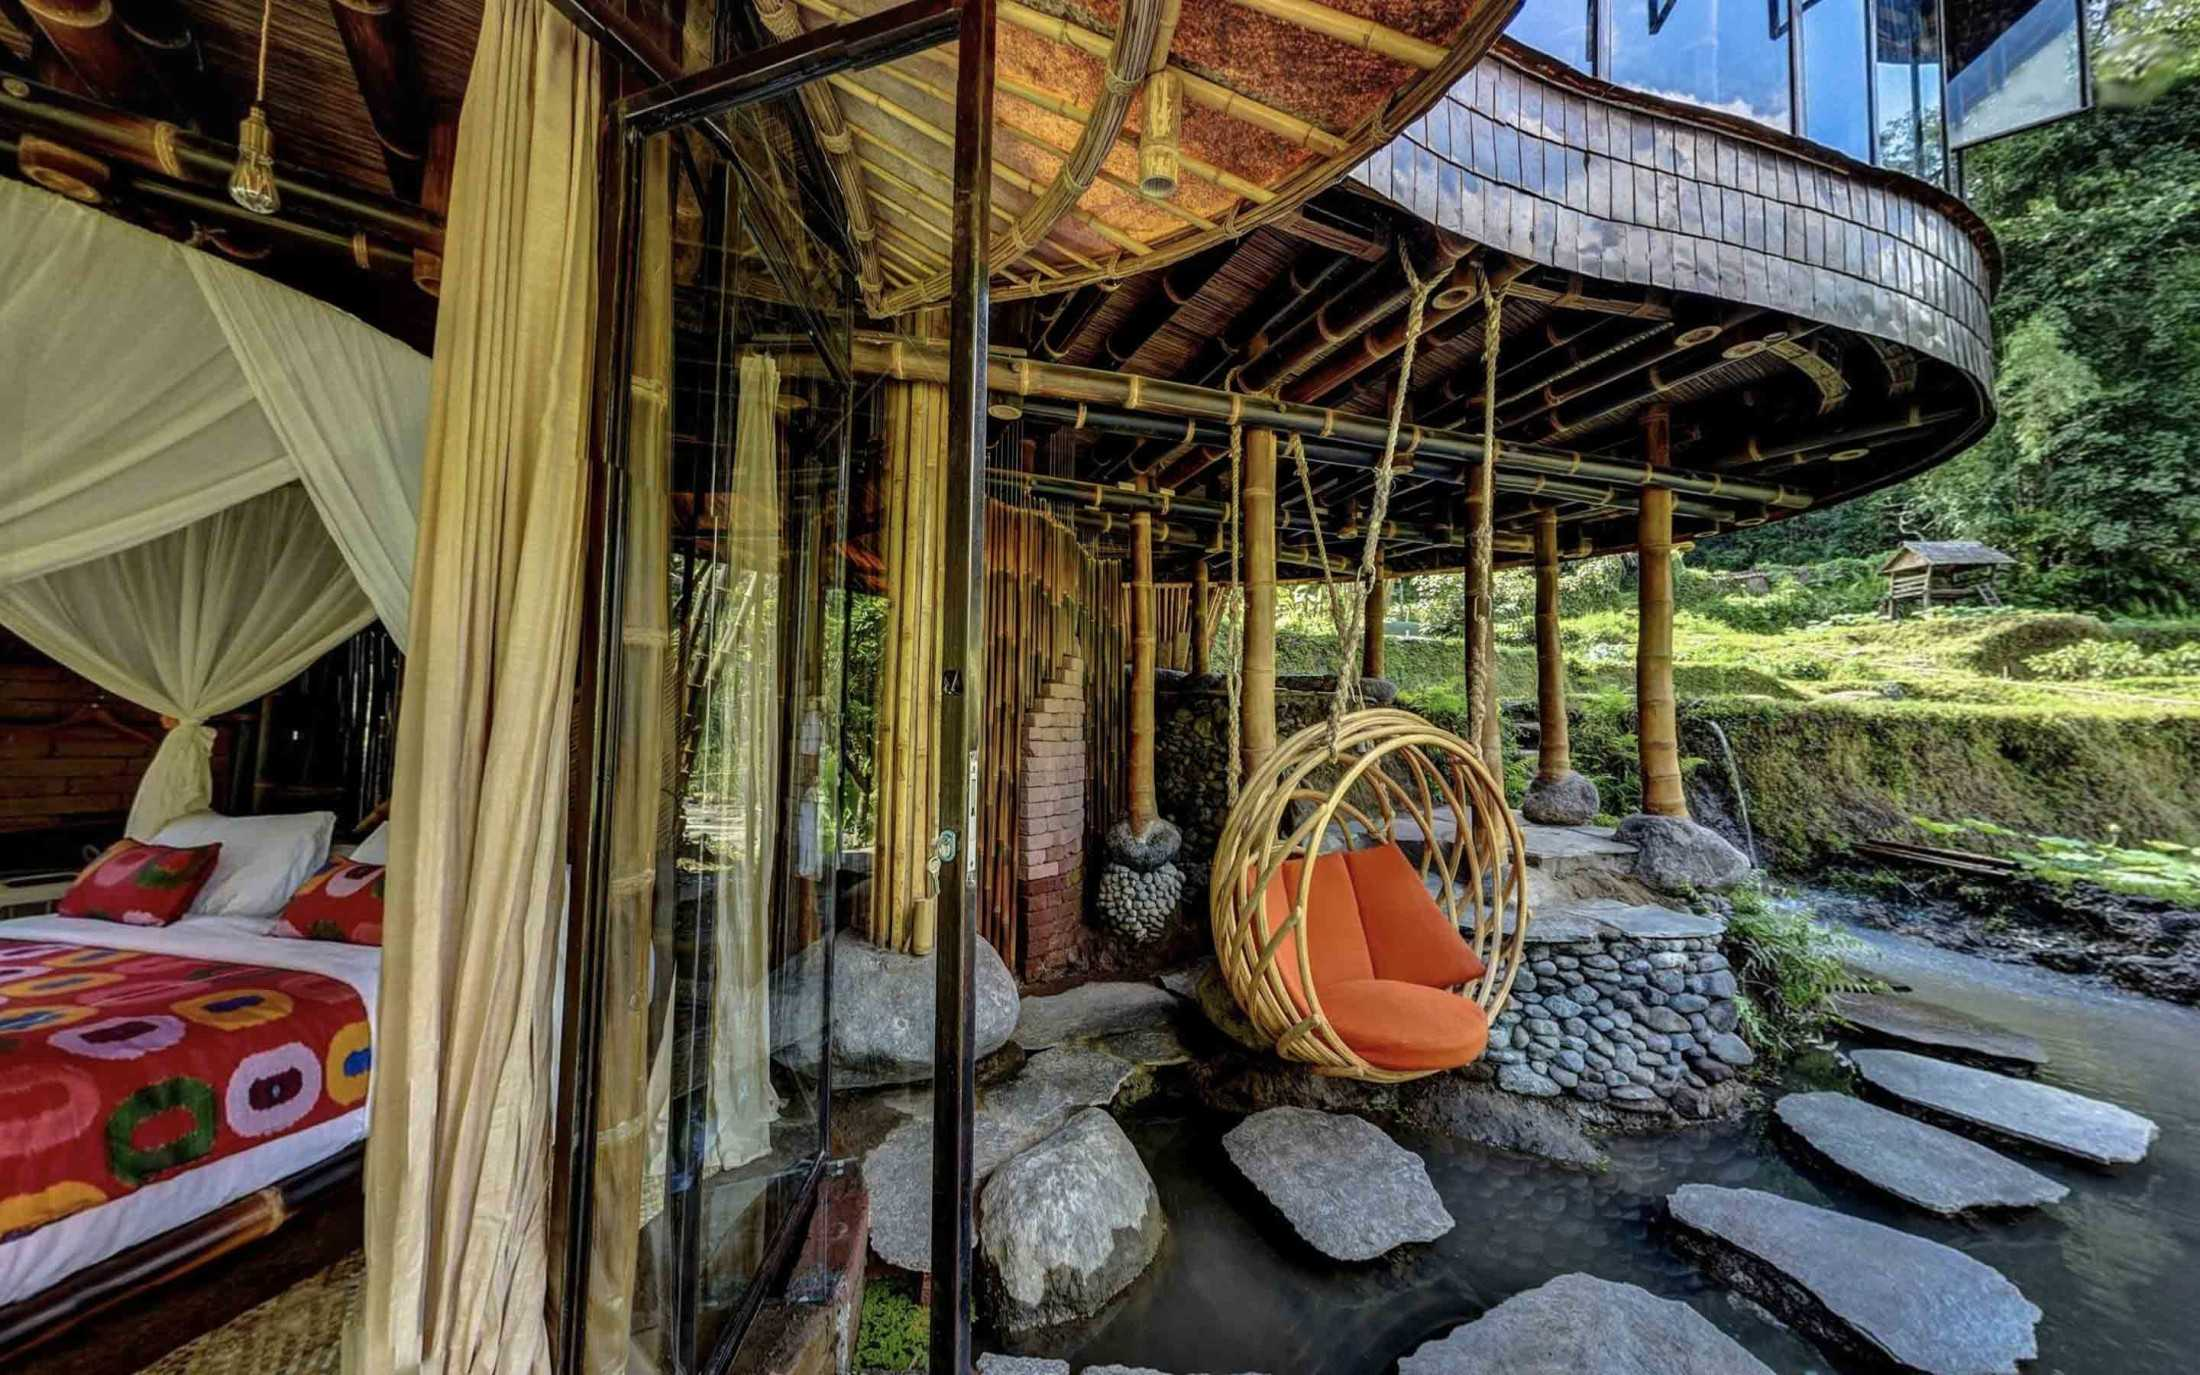 Agung Budi Raharsa | Architecture & Engineering Riverbend Bamboo House - Bali Bali, Indonesia Bali, Indonesia Courtyard Tropical 88704